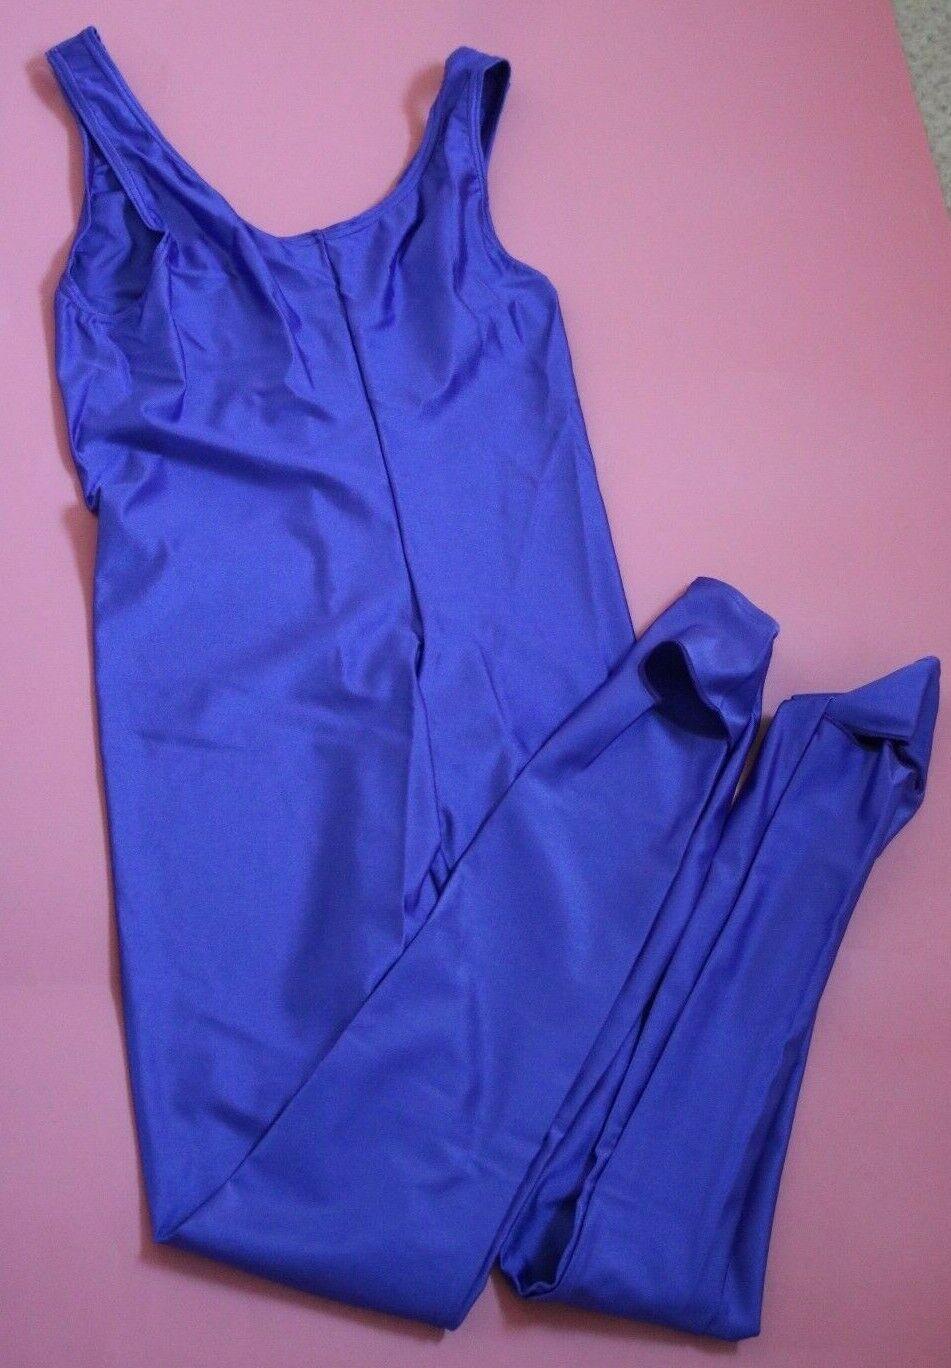 Adagio Purple Nylon Lycra Sleeveless Catsuit Small Adult NEW